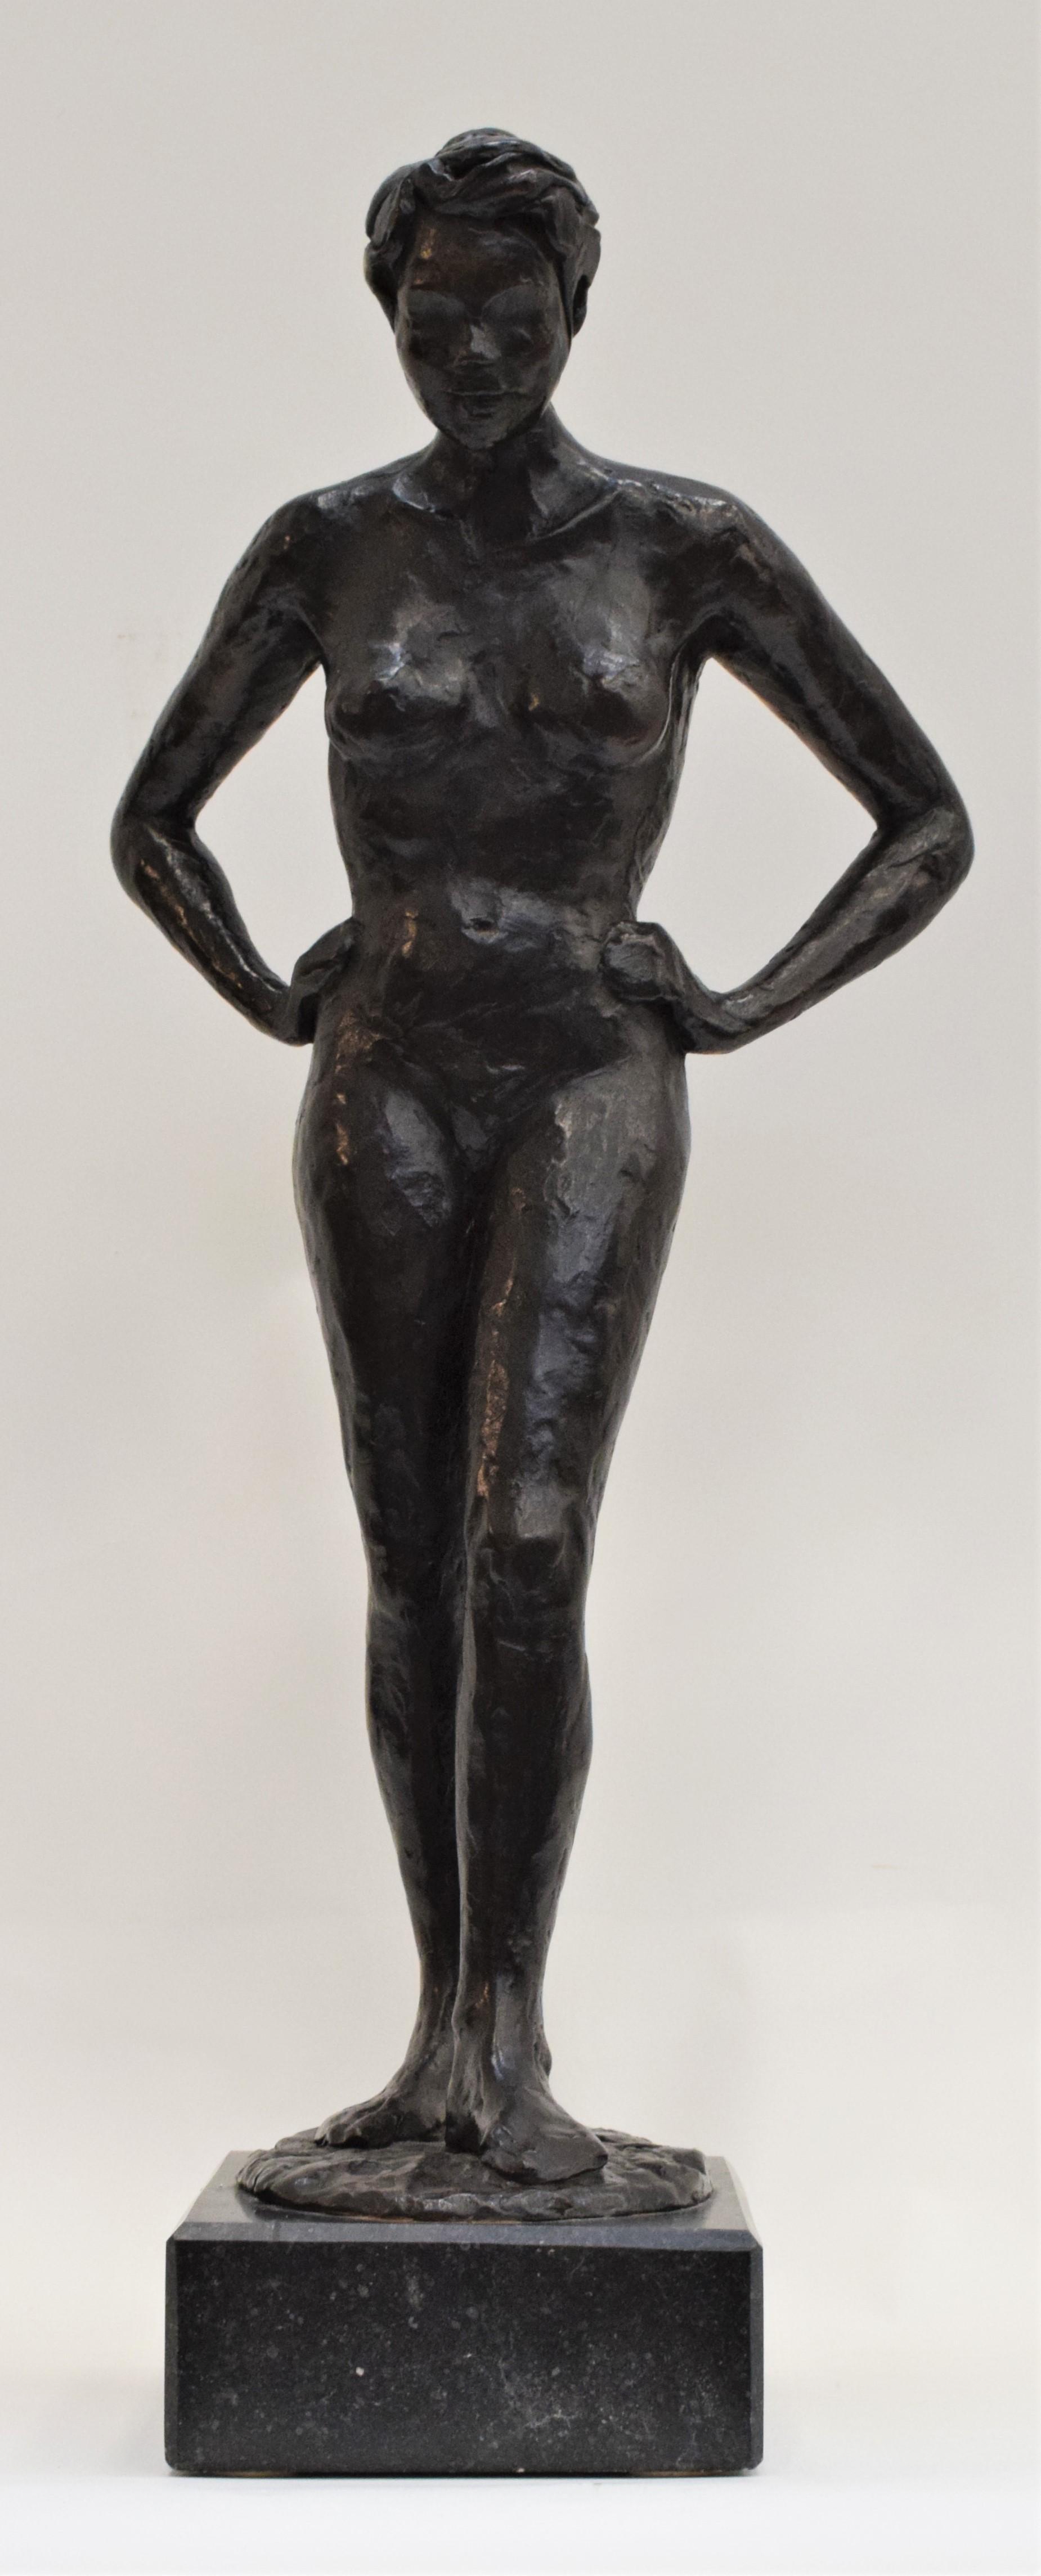 Bronze statue of a woman, Anneke Hei - Degenhardt (1951), Signed